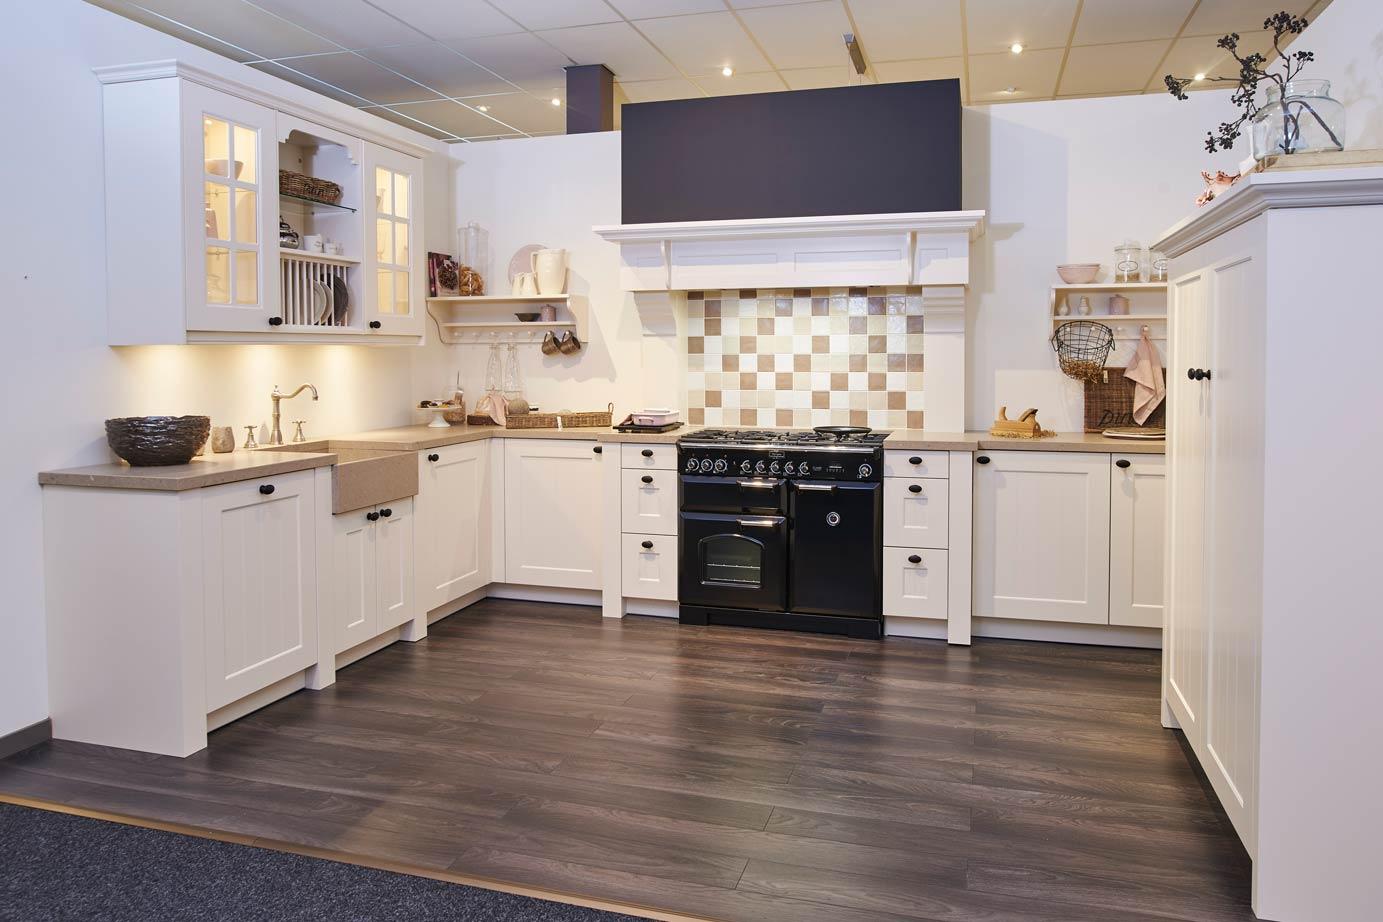 Fornuis Keuken Landelijk : Grote landelijke keuken met falcon fornuis db keukens